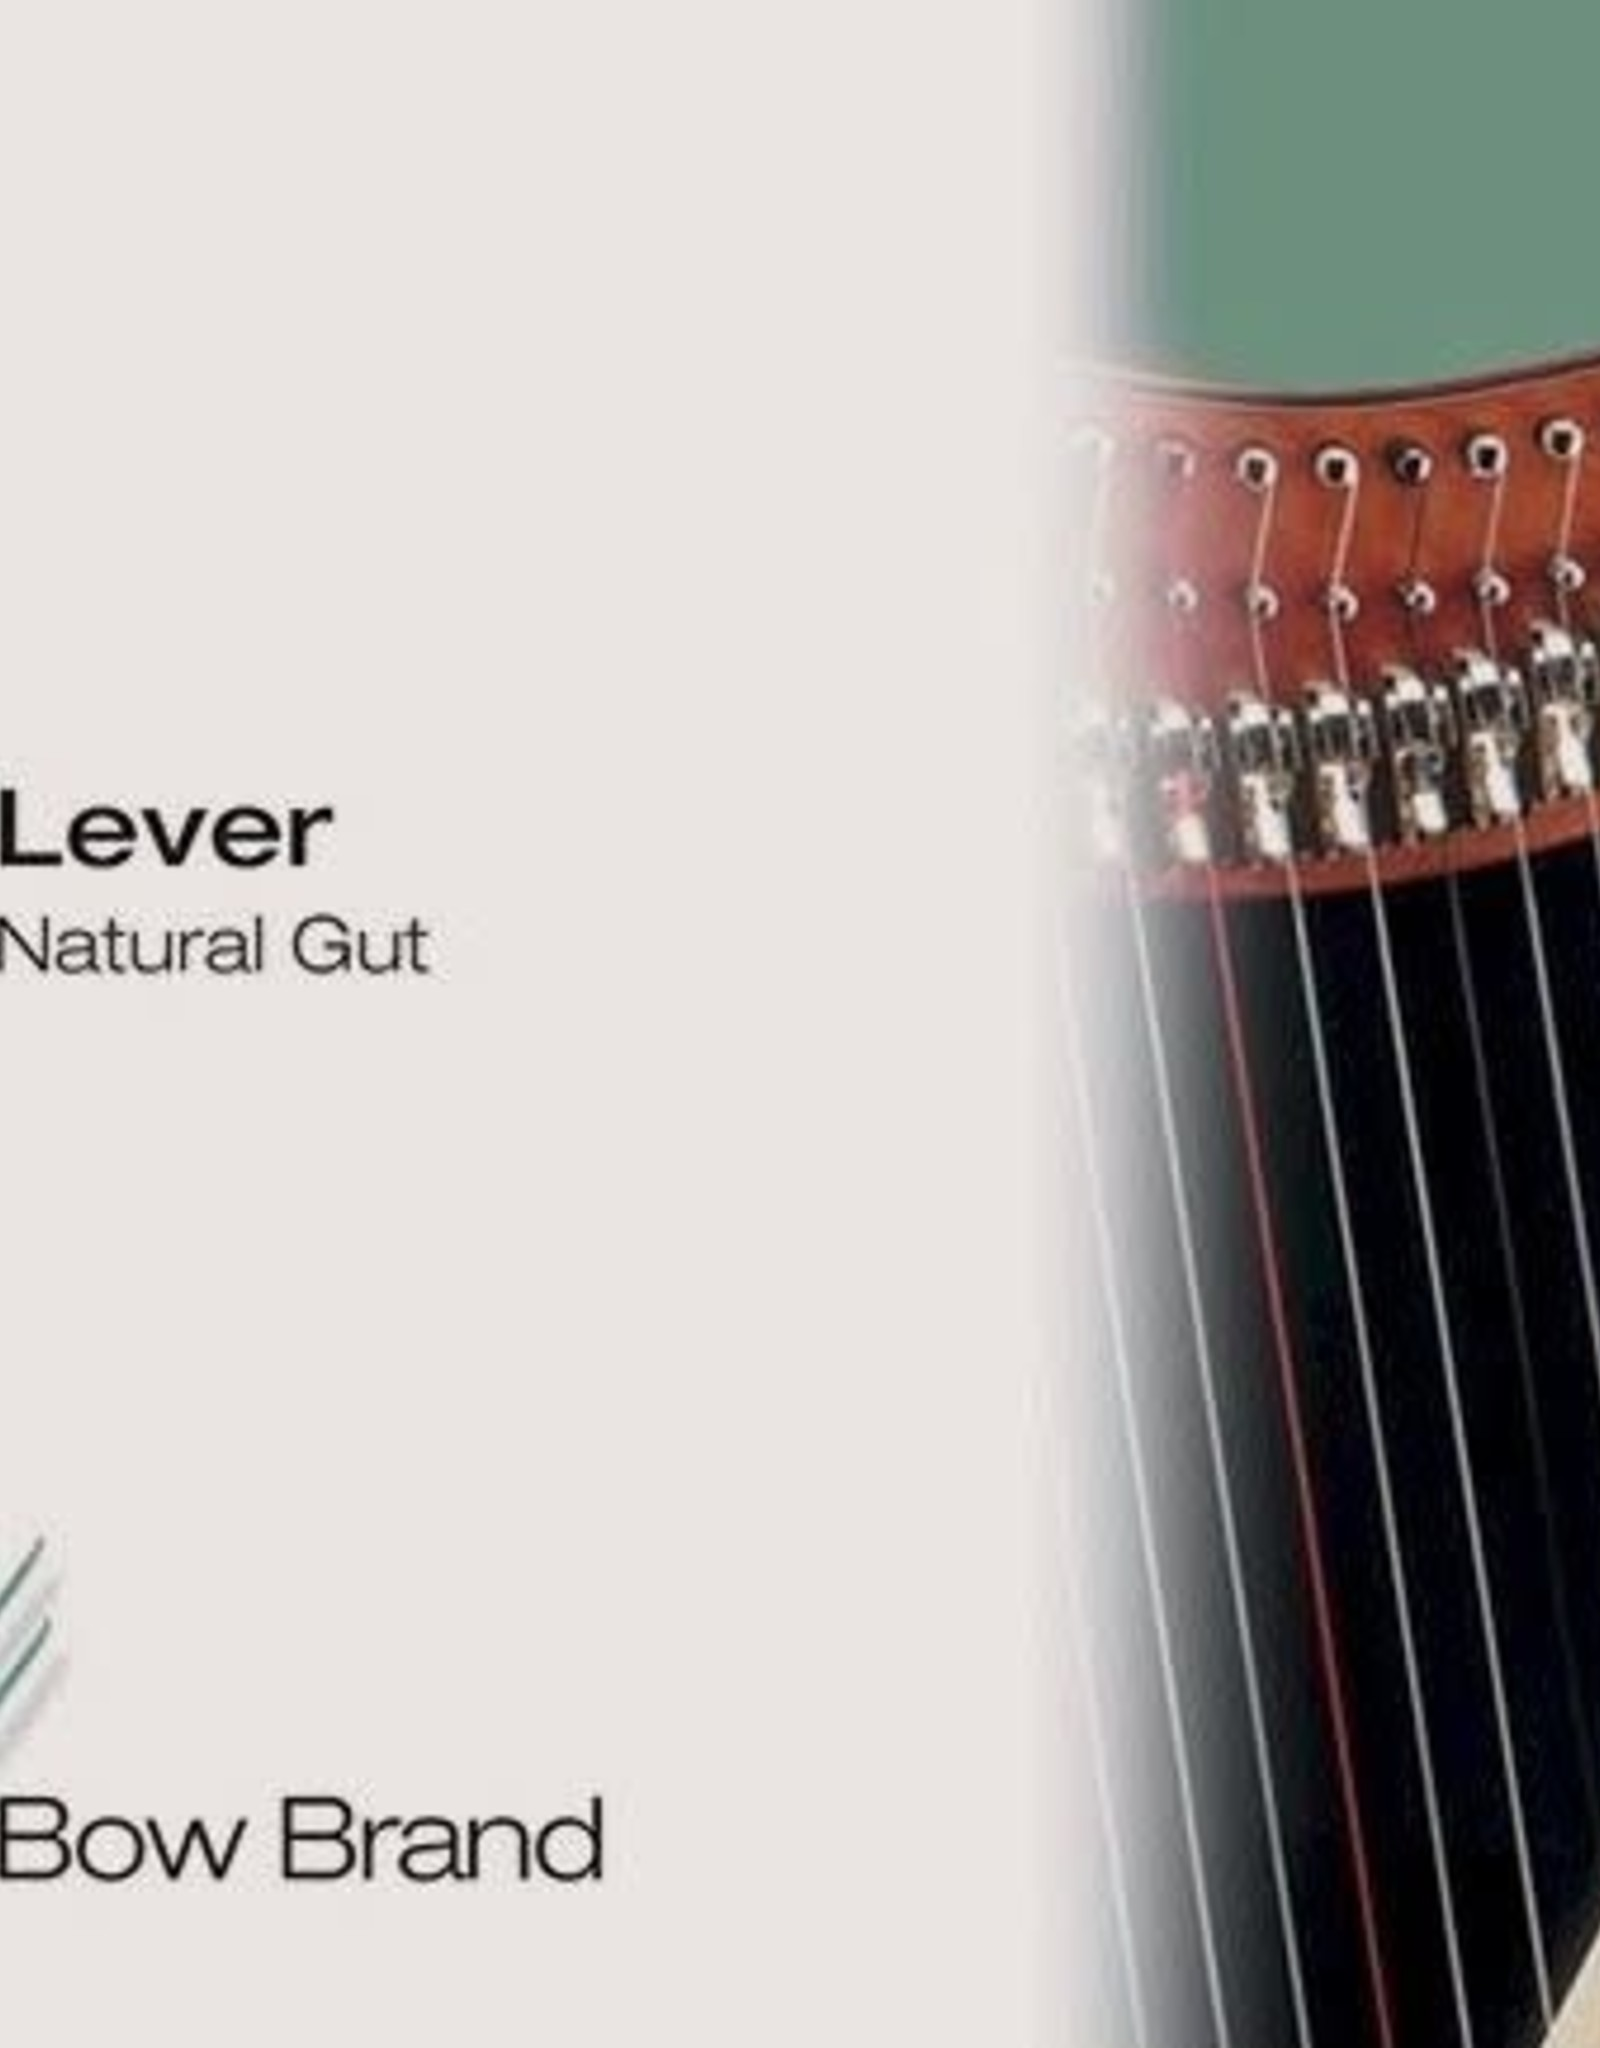 BOW BRAND  klep darm - lever GUT 7/1 fa